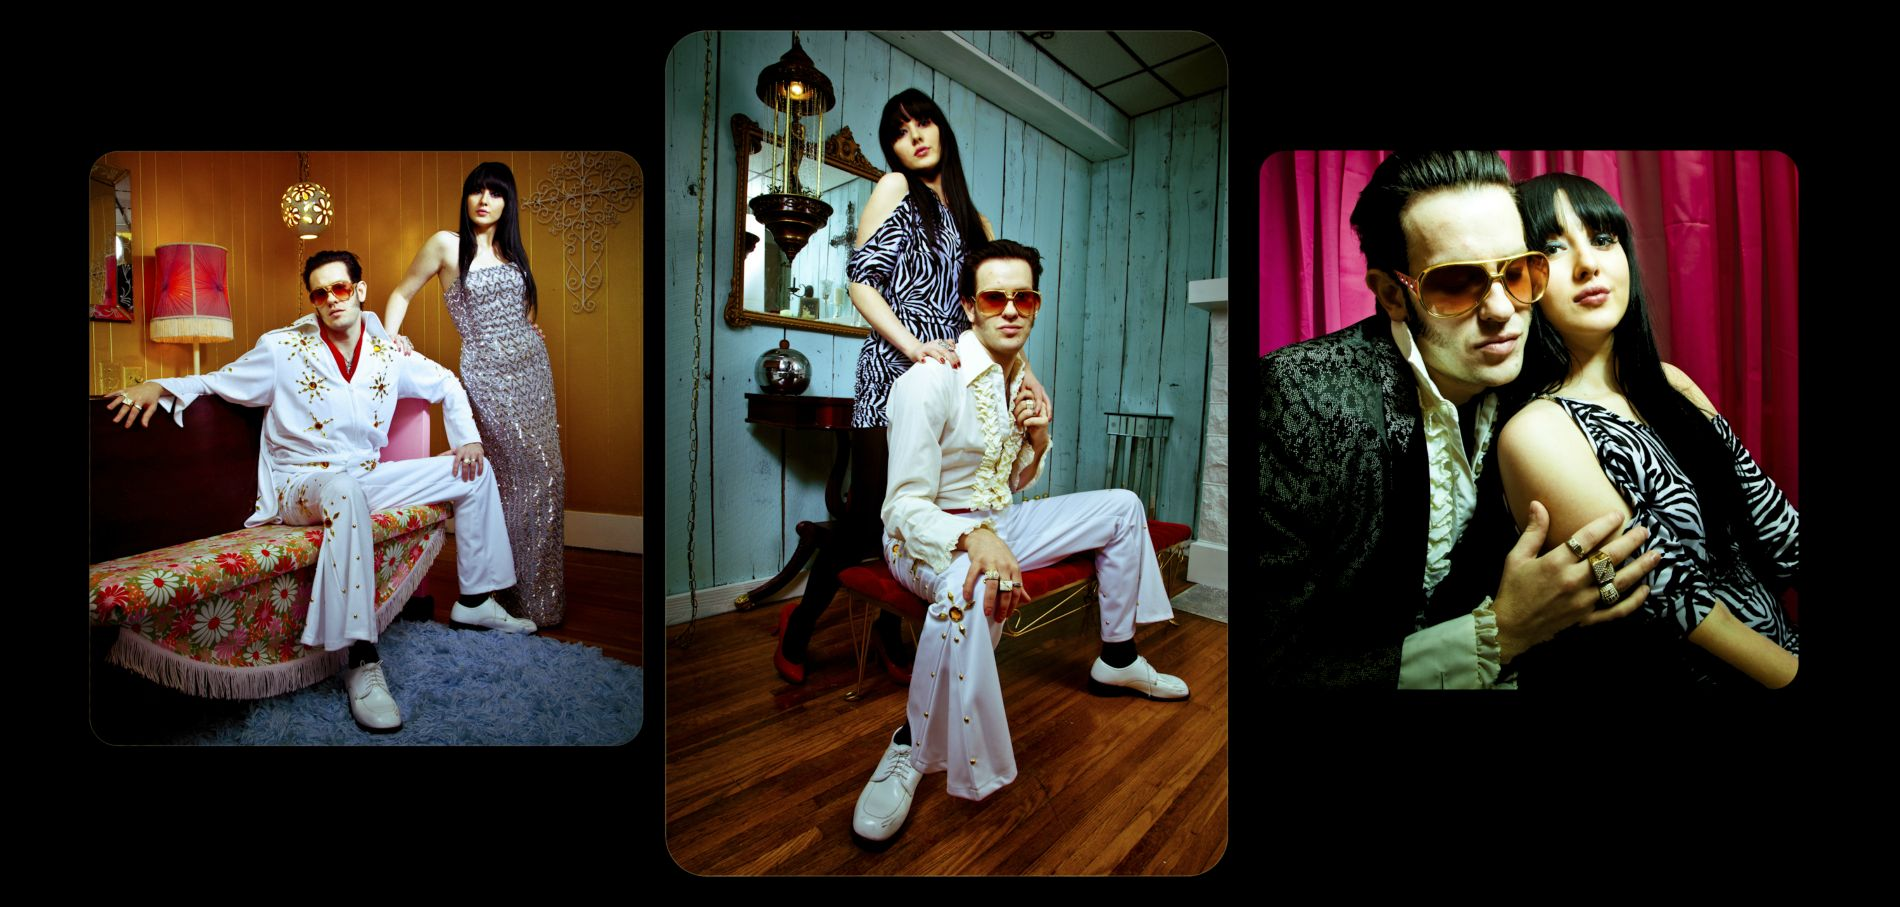 rory_white_Laws as Elvis001.jpg